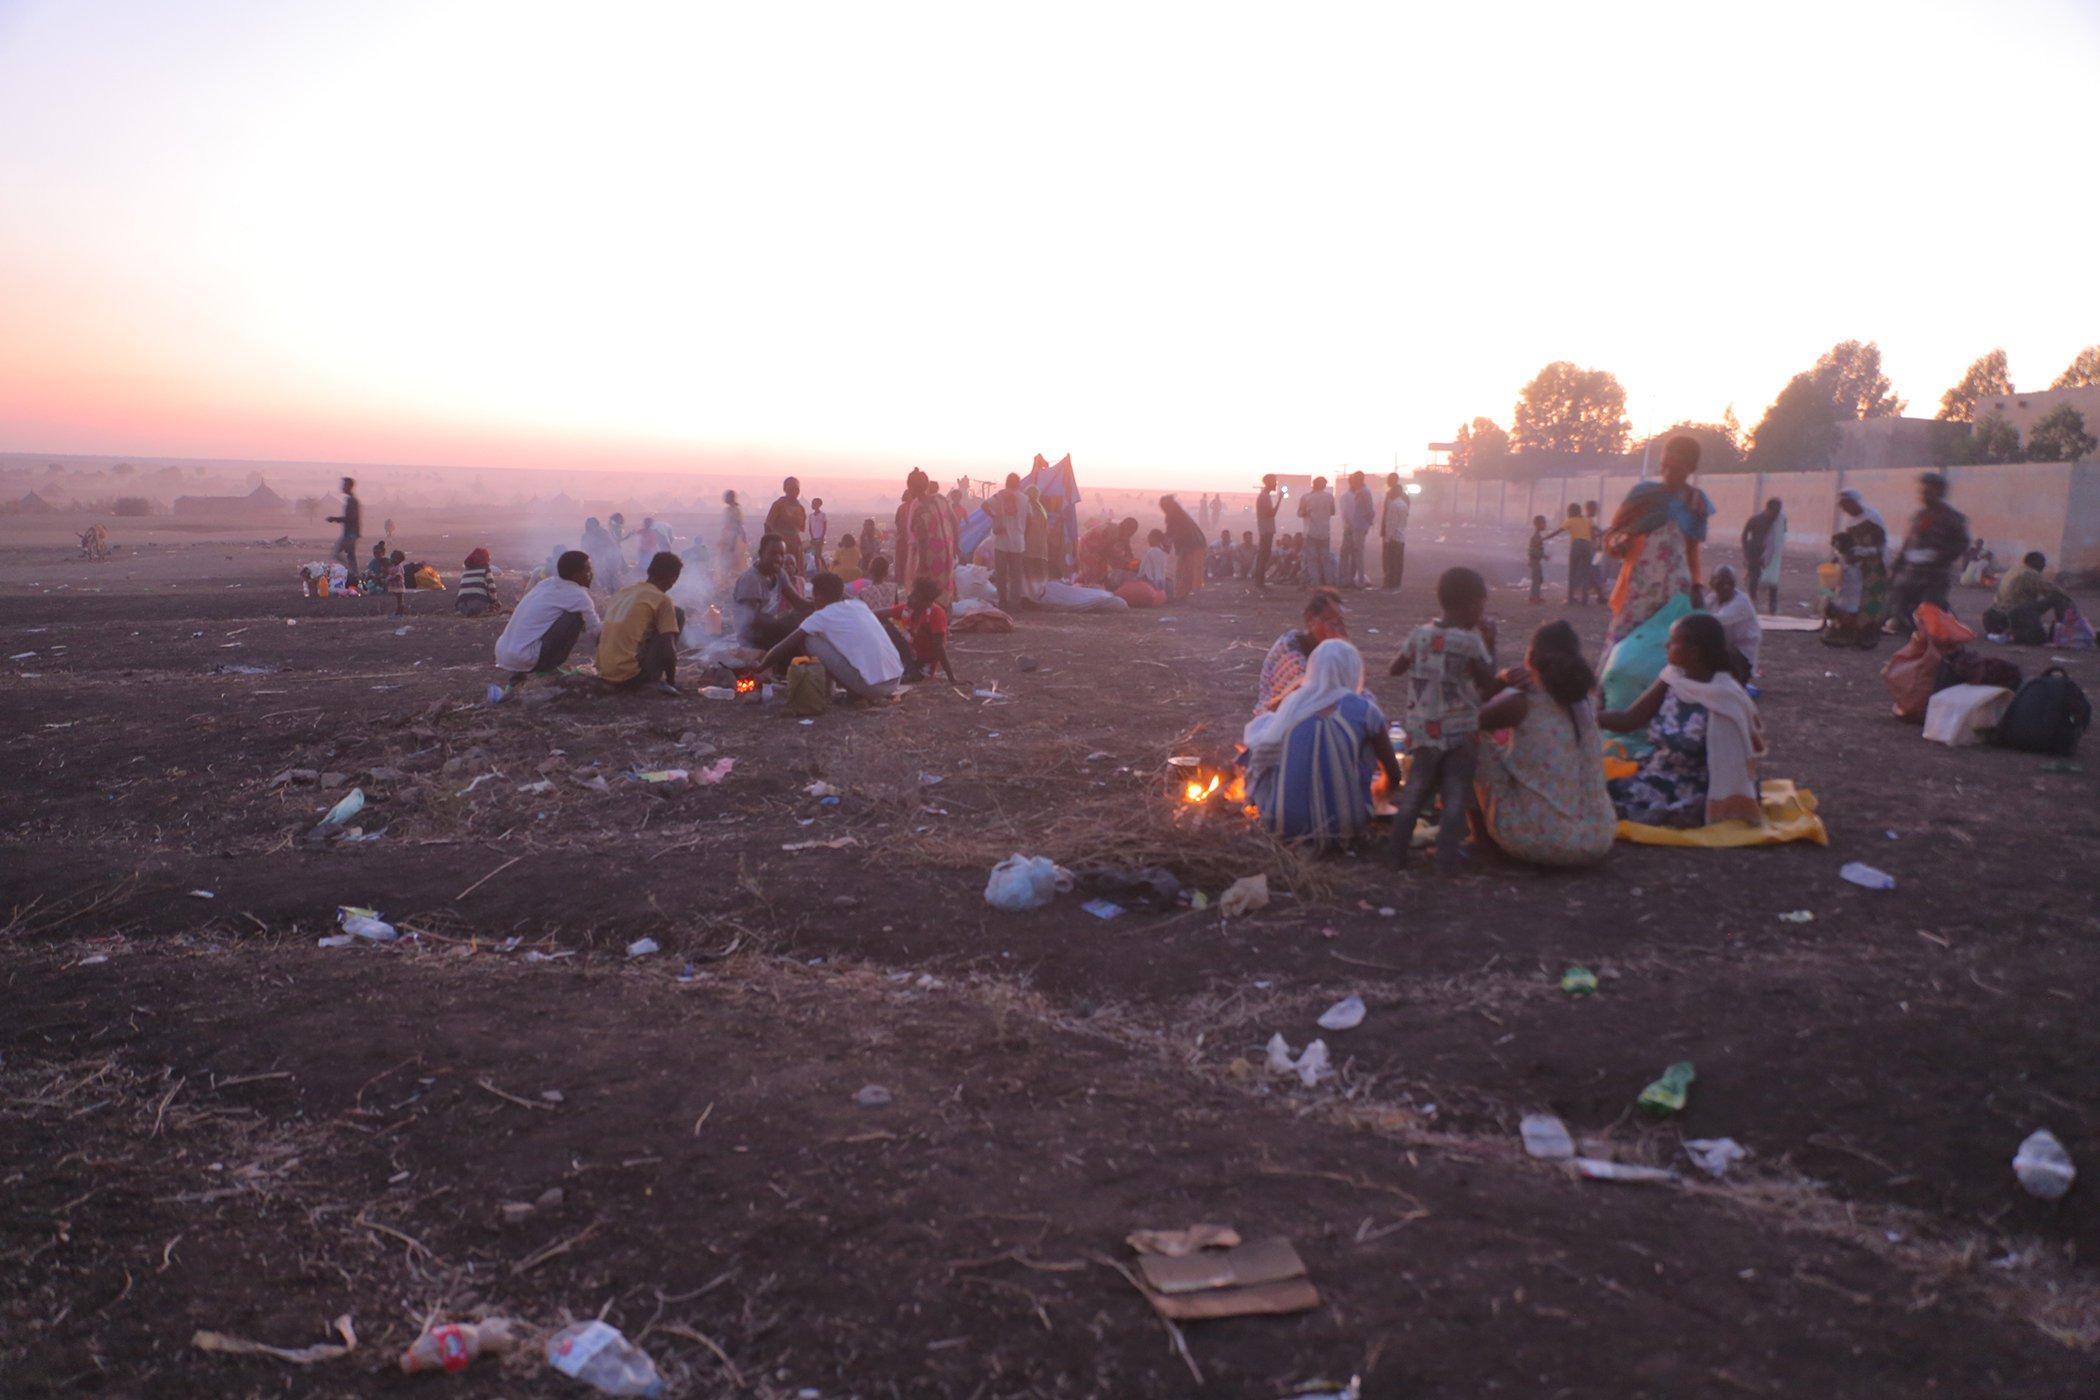 Ethiopia-Tigray-Refugees-Humanitarian-Crisis-UNHCR-004.jpg